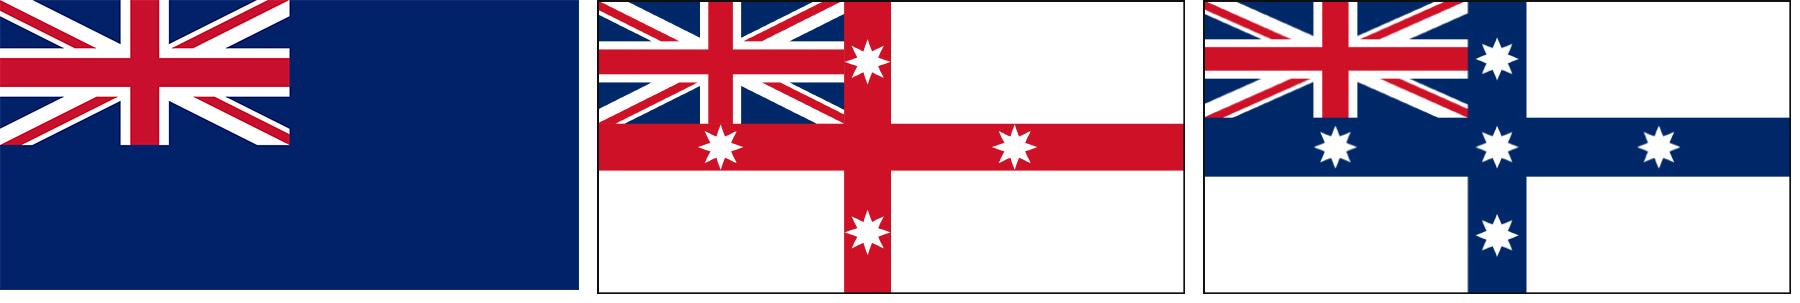 australie 01